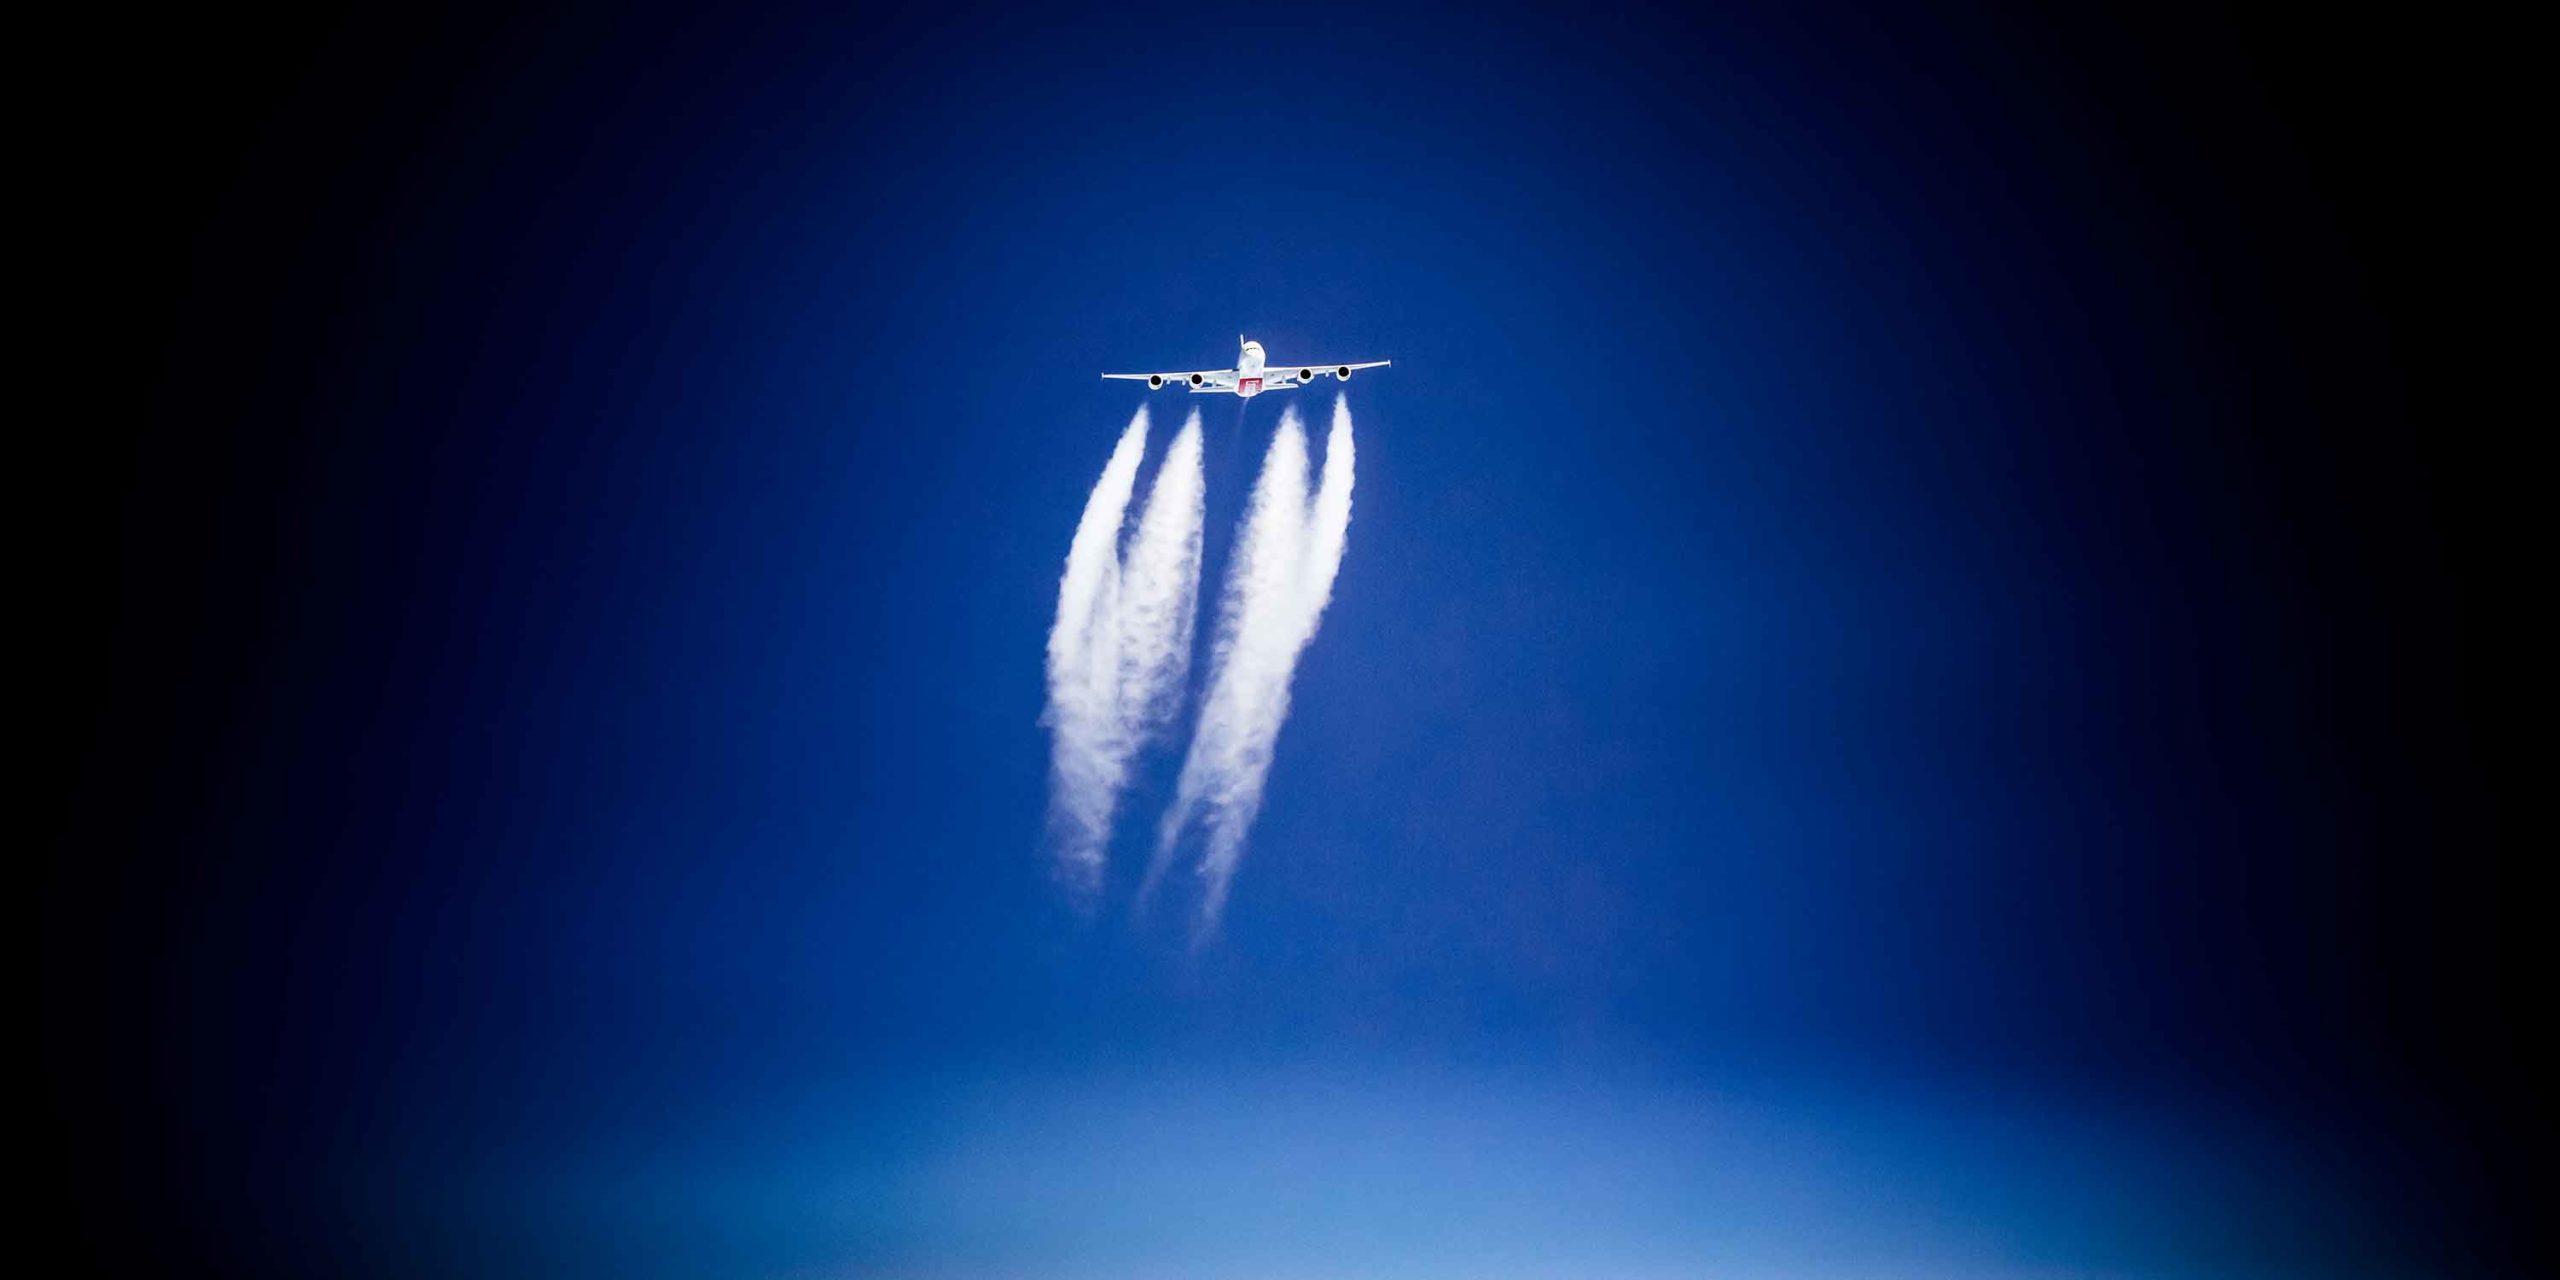 Emirates Airbus 380 Air to Air